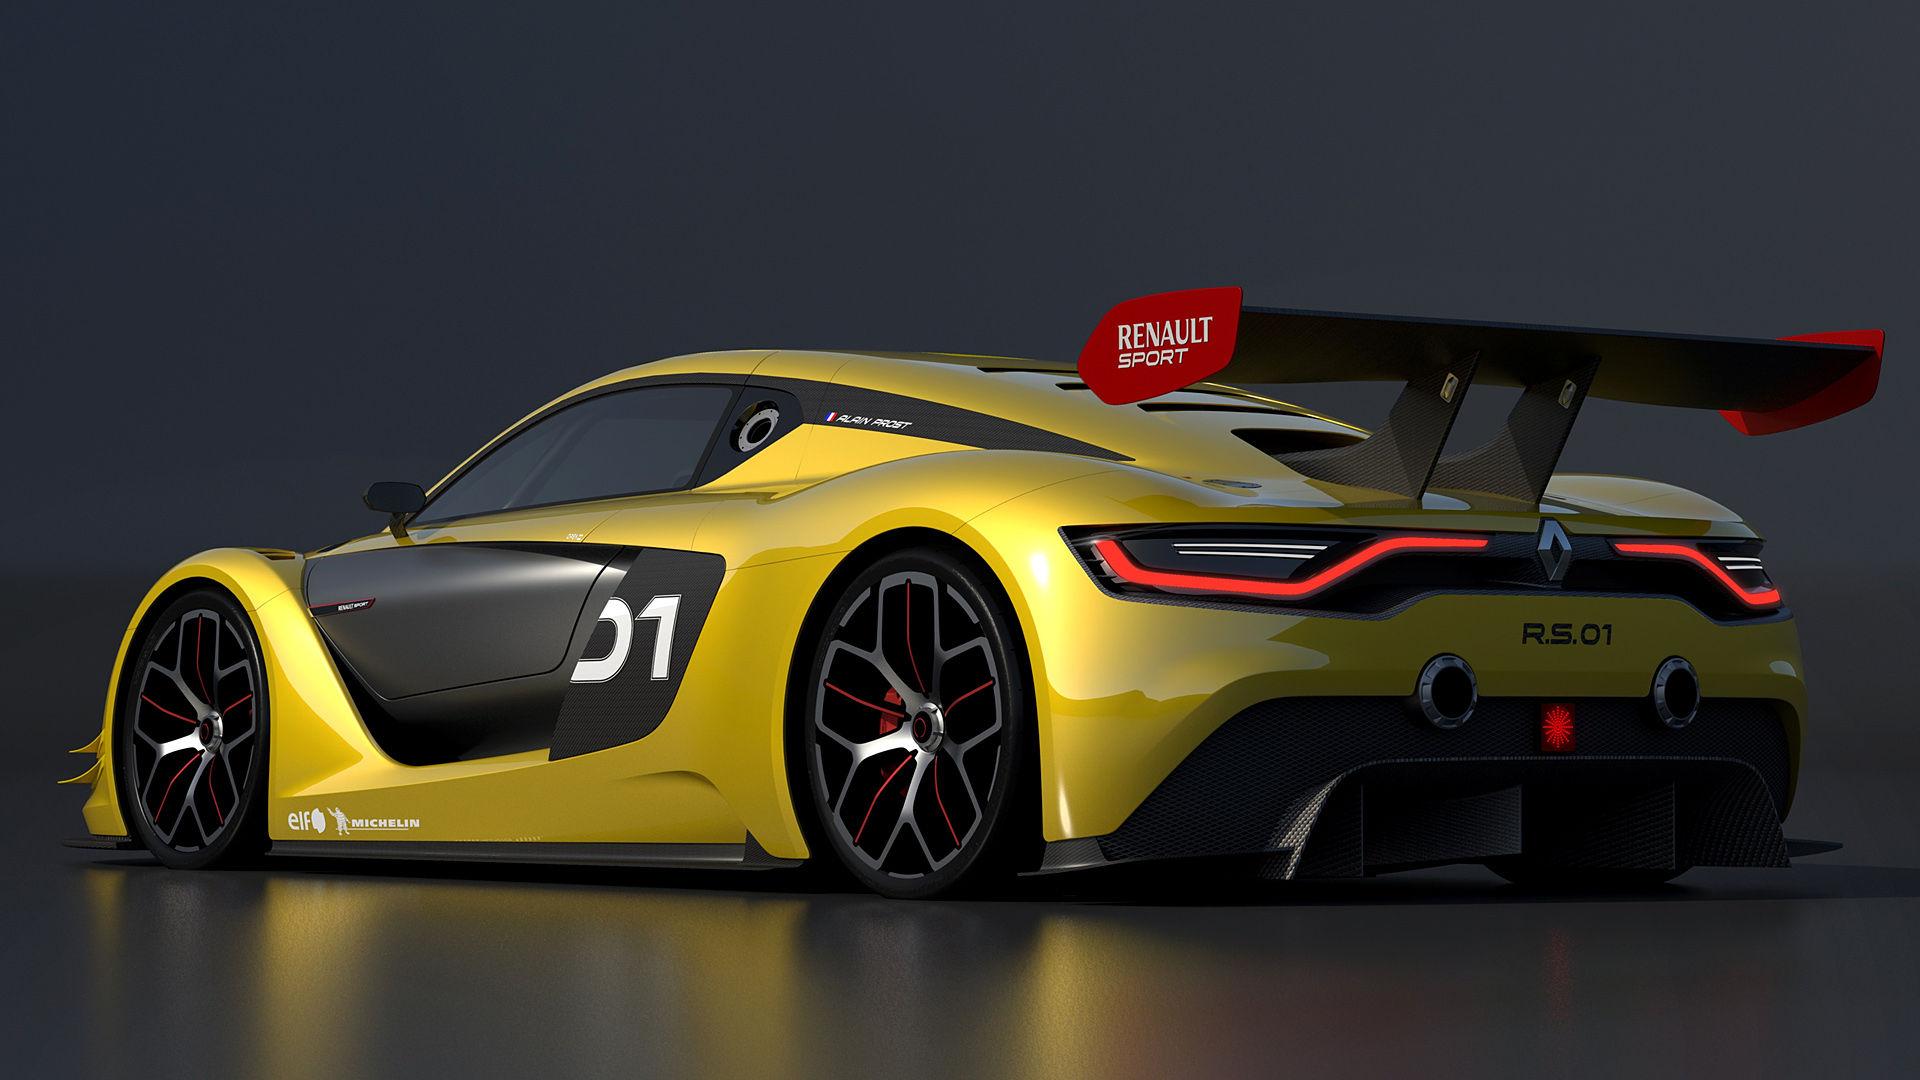 2015 Renault Sport RS 01